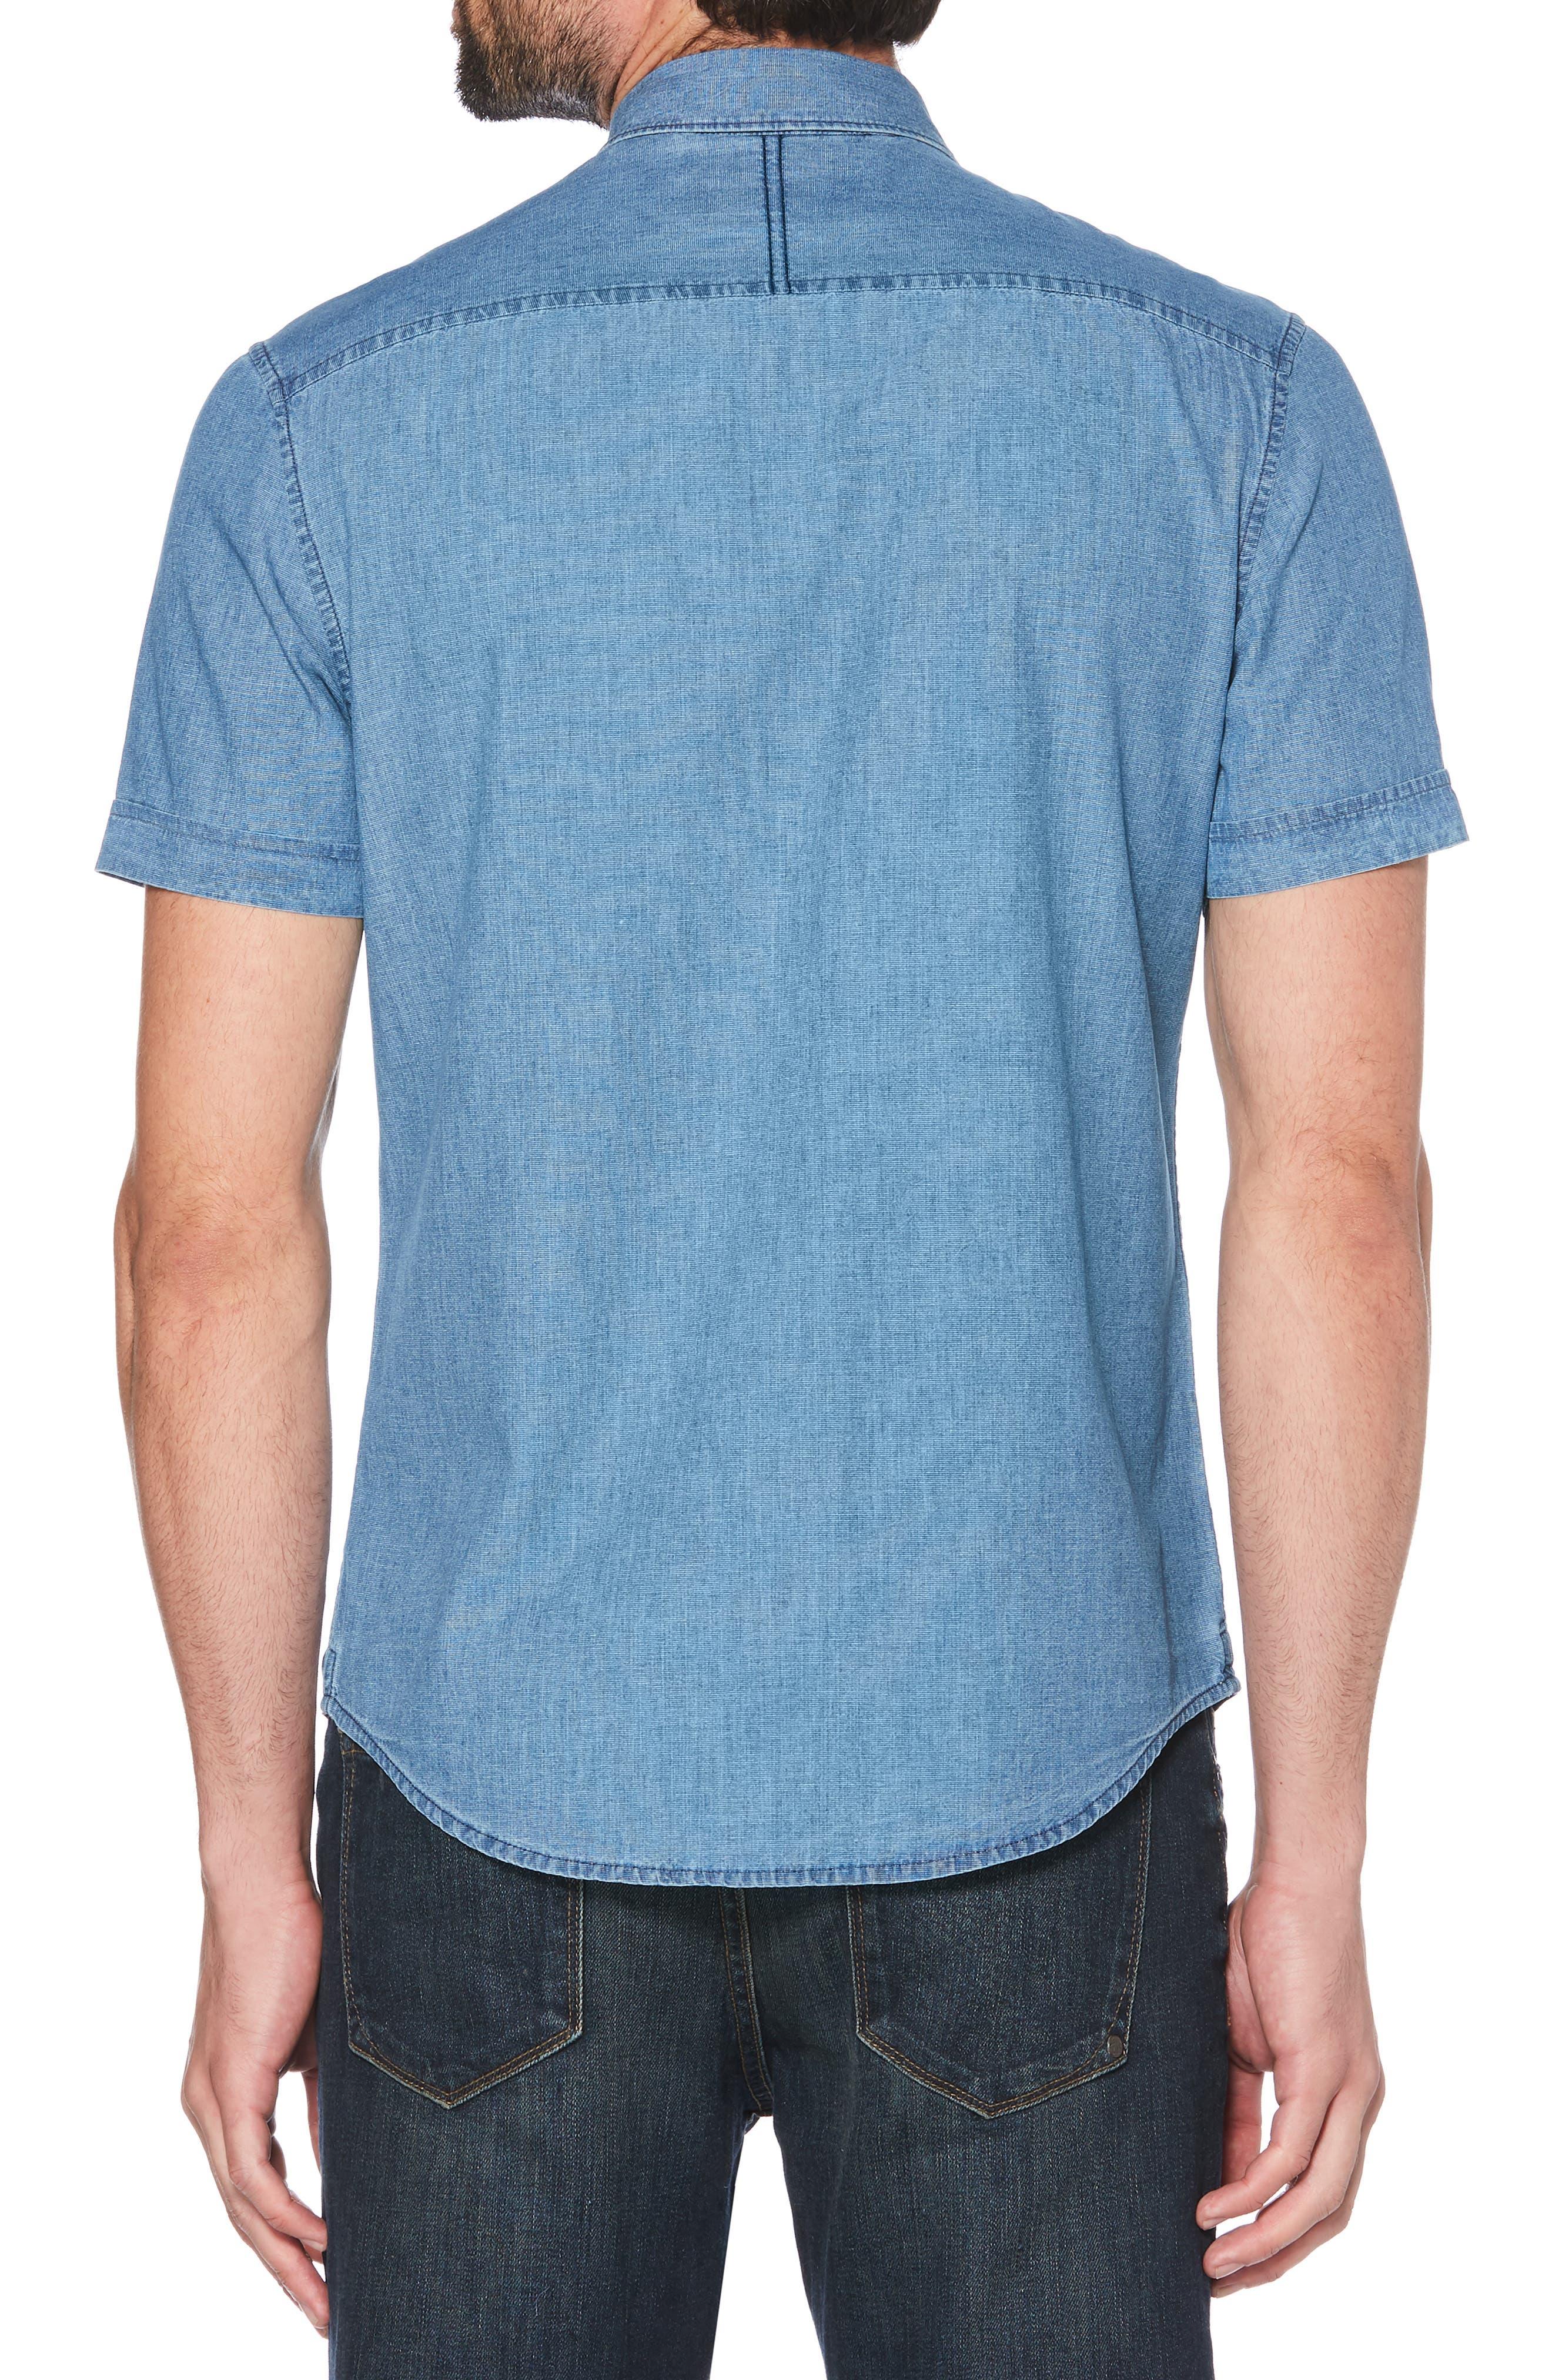 ORIGINAL PENGUIN, Pinpoint Slim Fit Chambray Shirt, Alternate thumbnail 3, color, 489